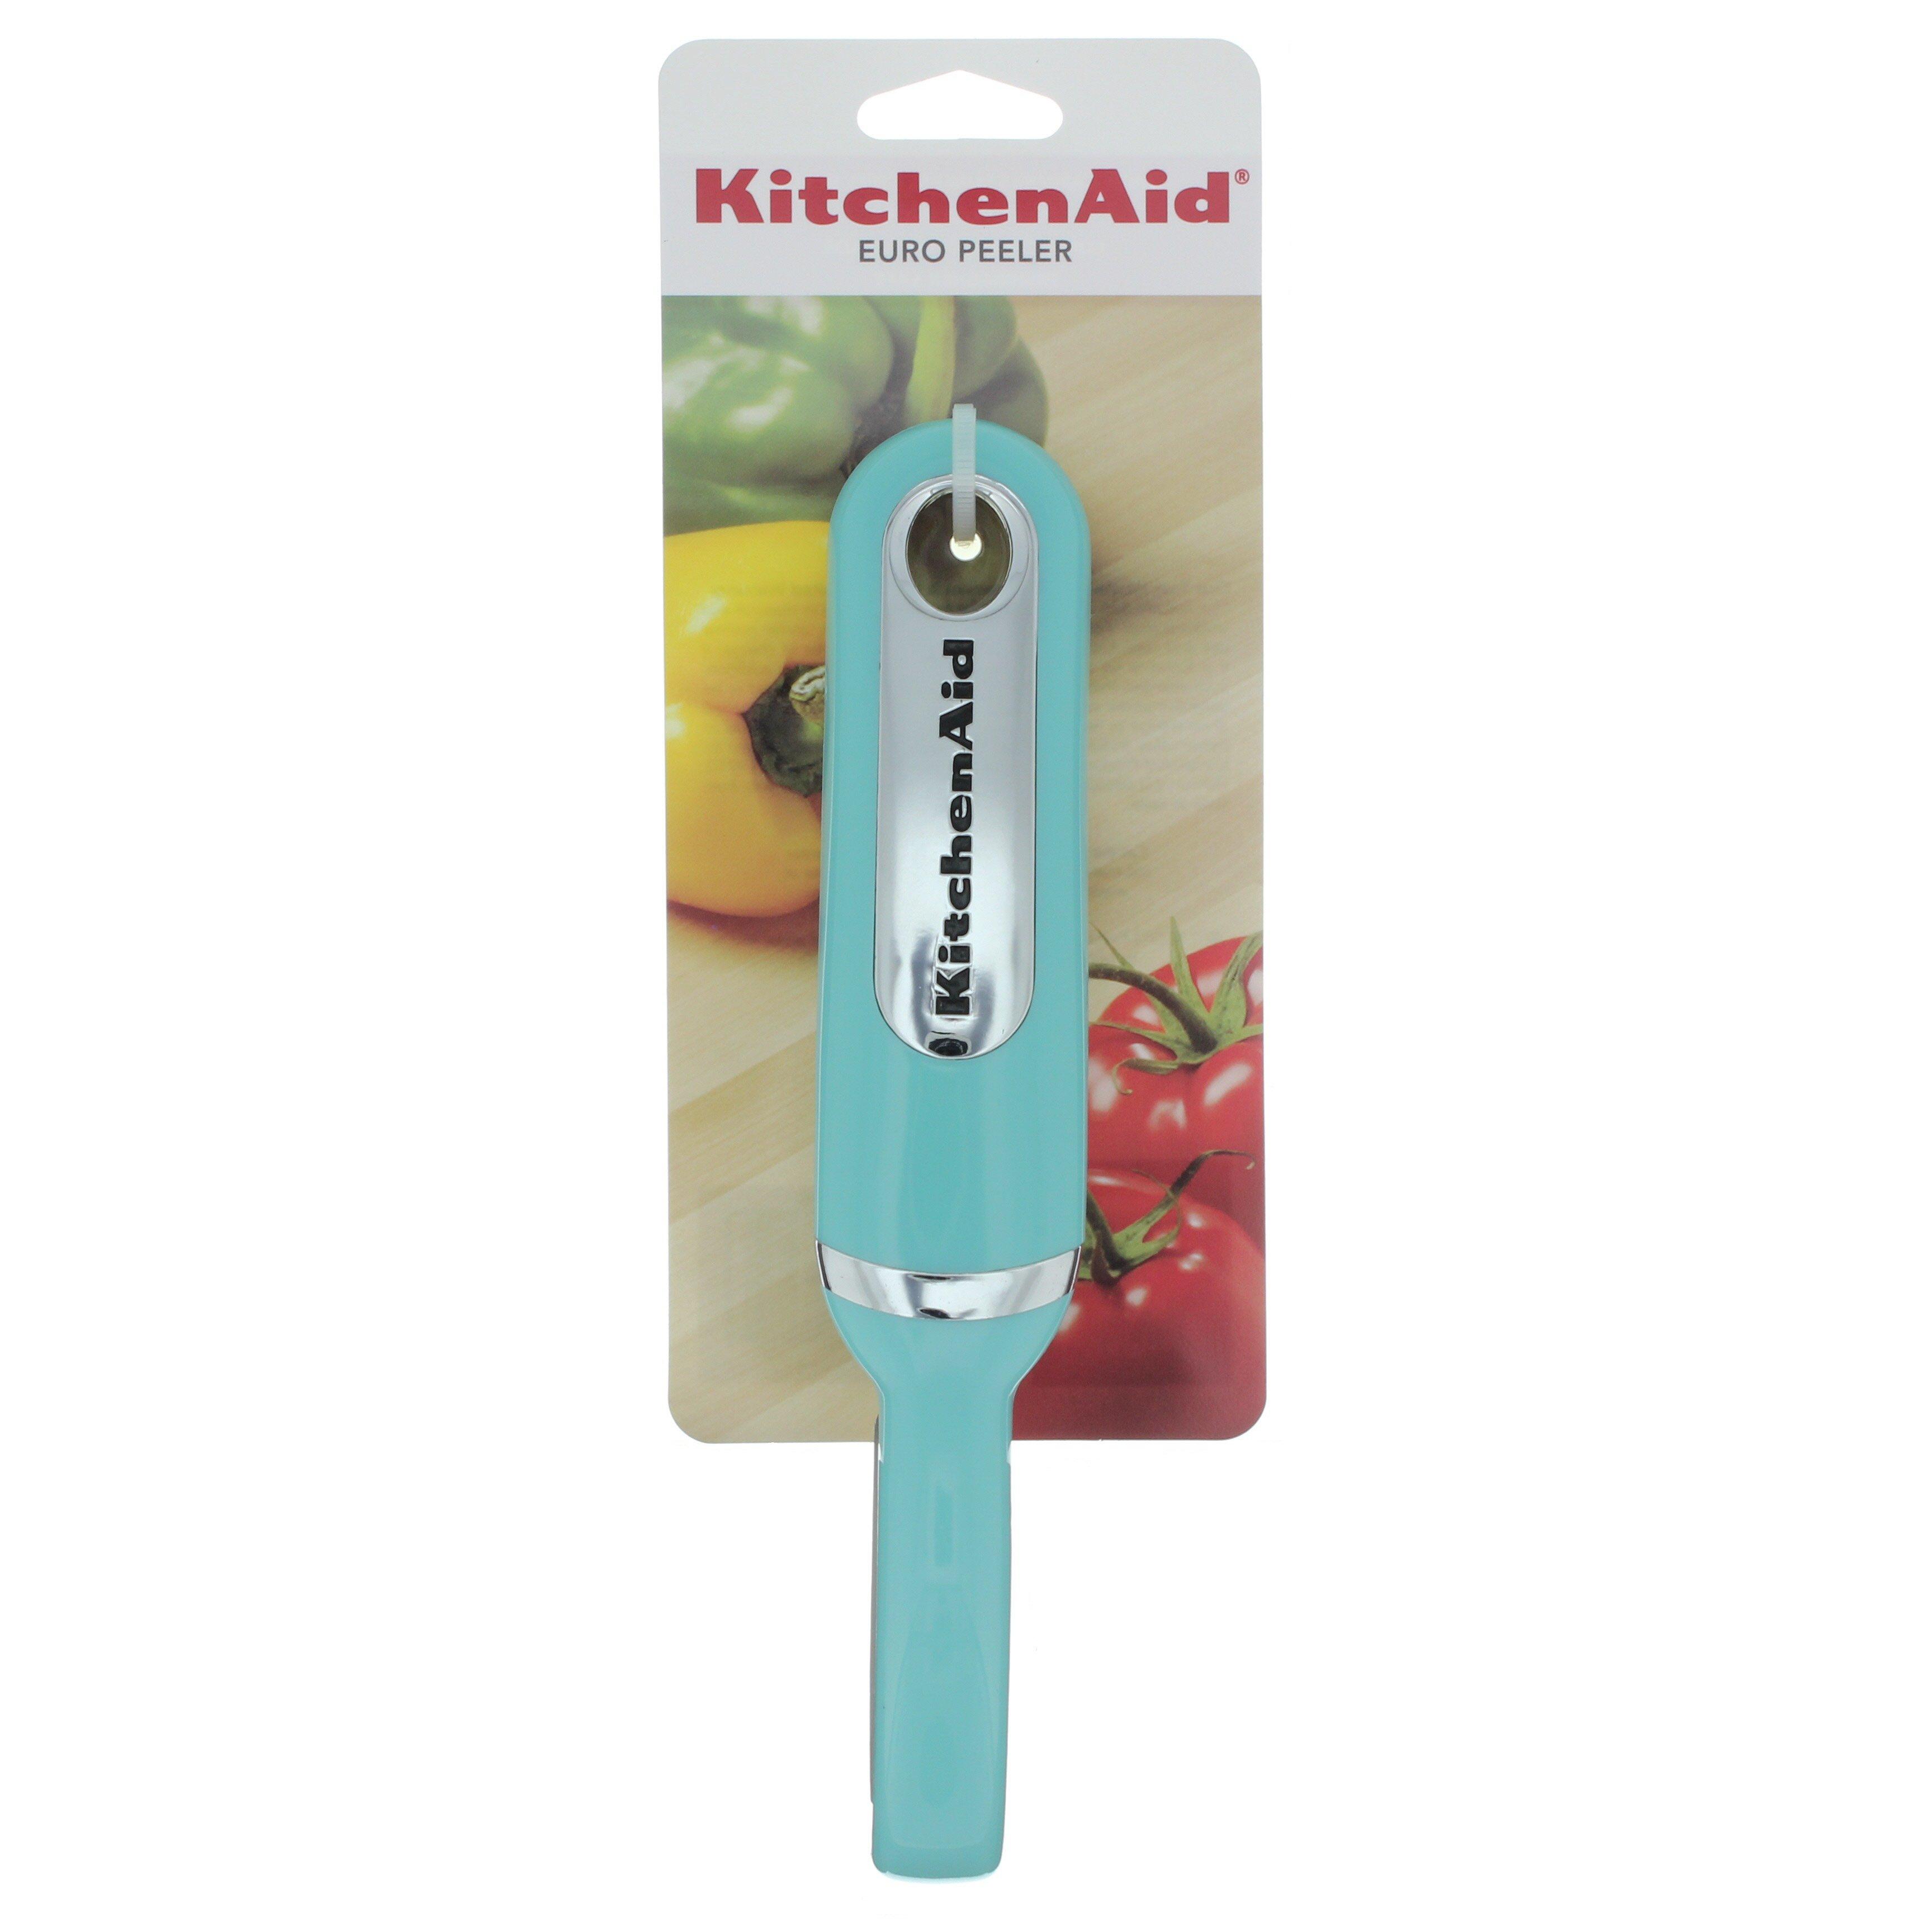 Kitchenaid Aqua Sky Euro Peeler Shop Utensils Gadgets At H E B